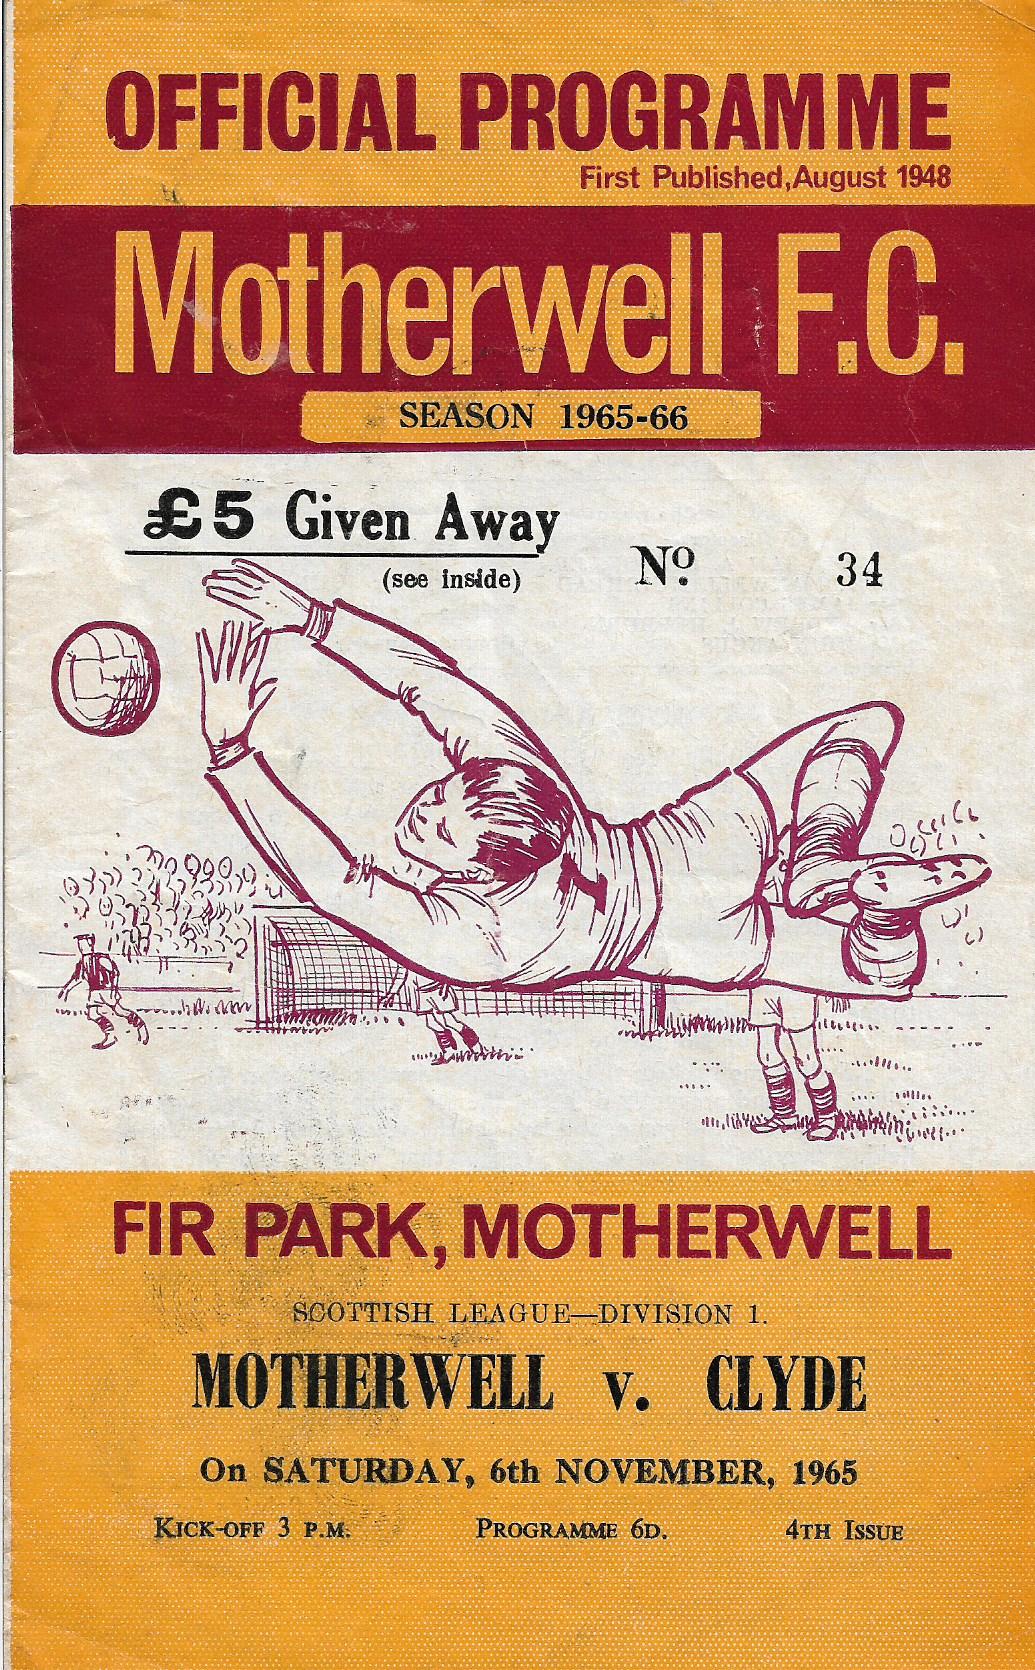 Programme Cover versus Clyde